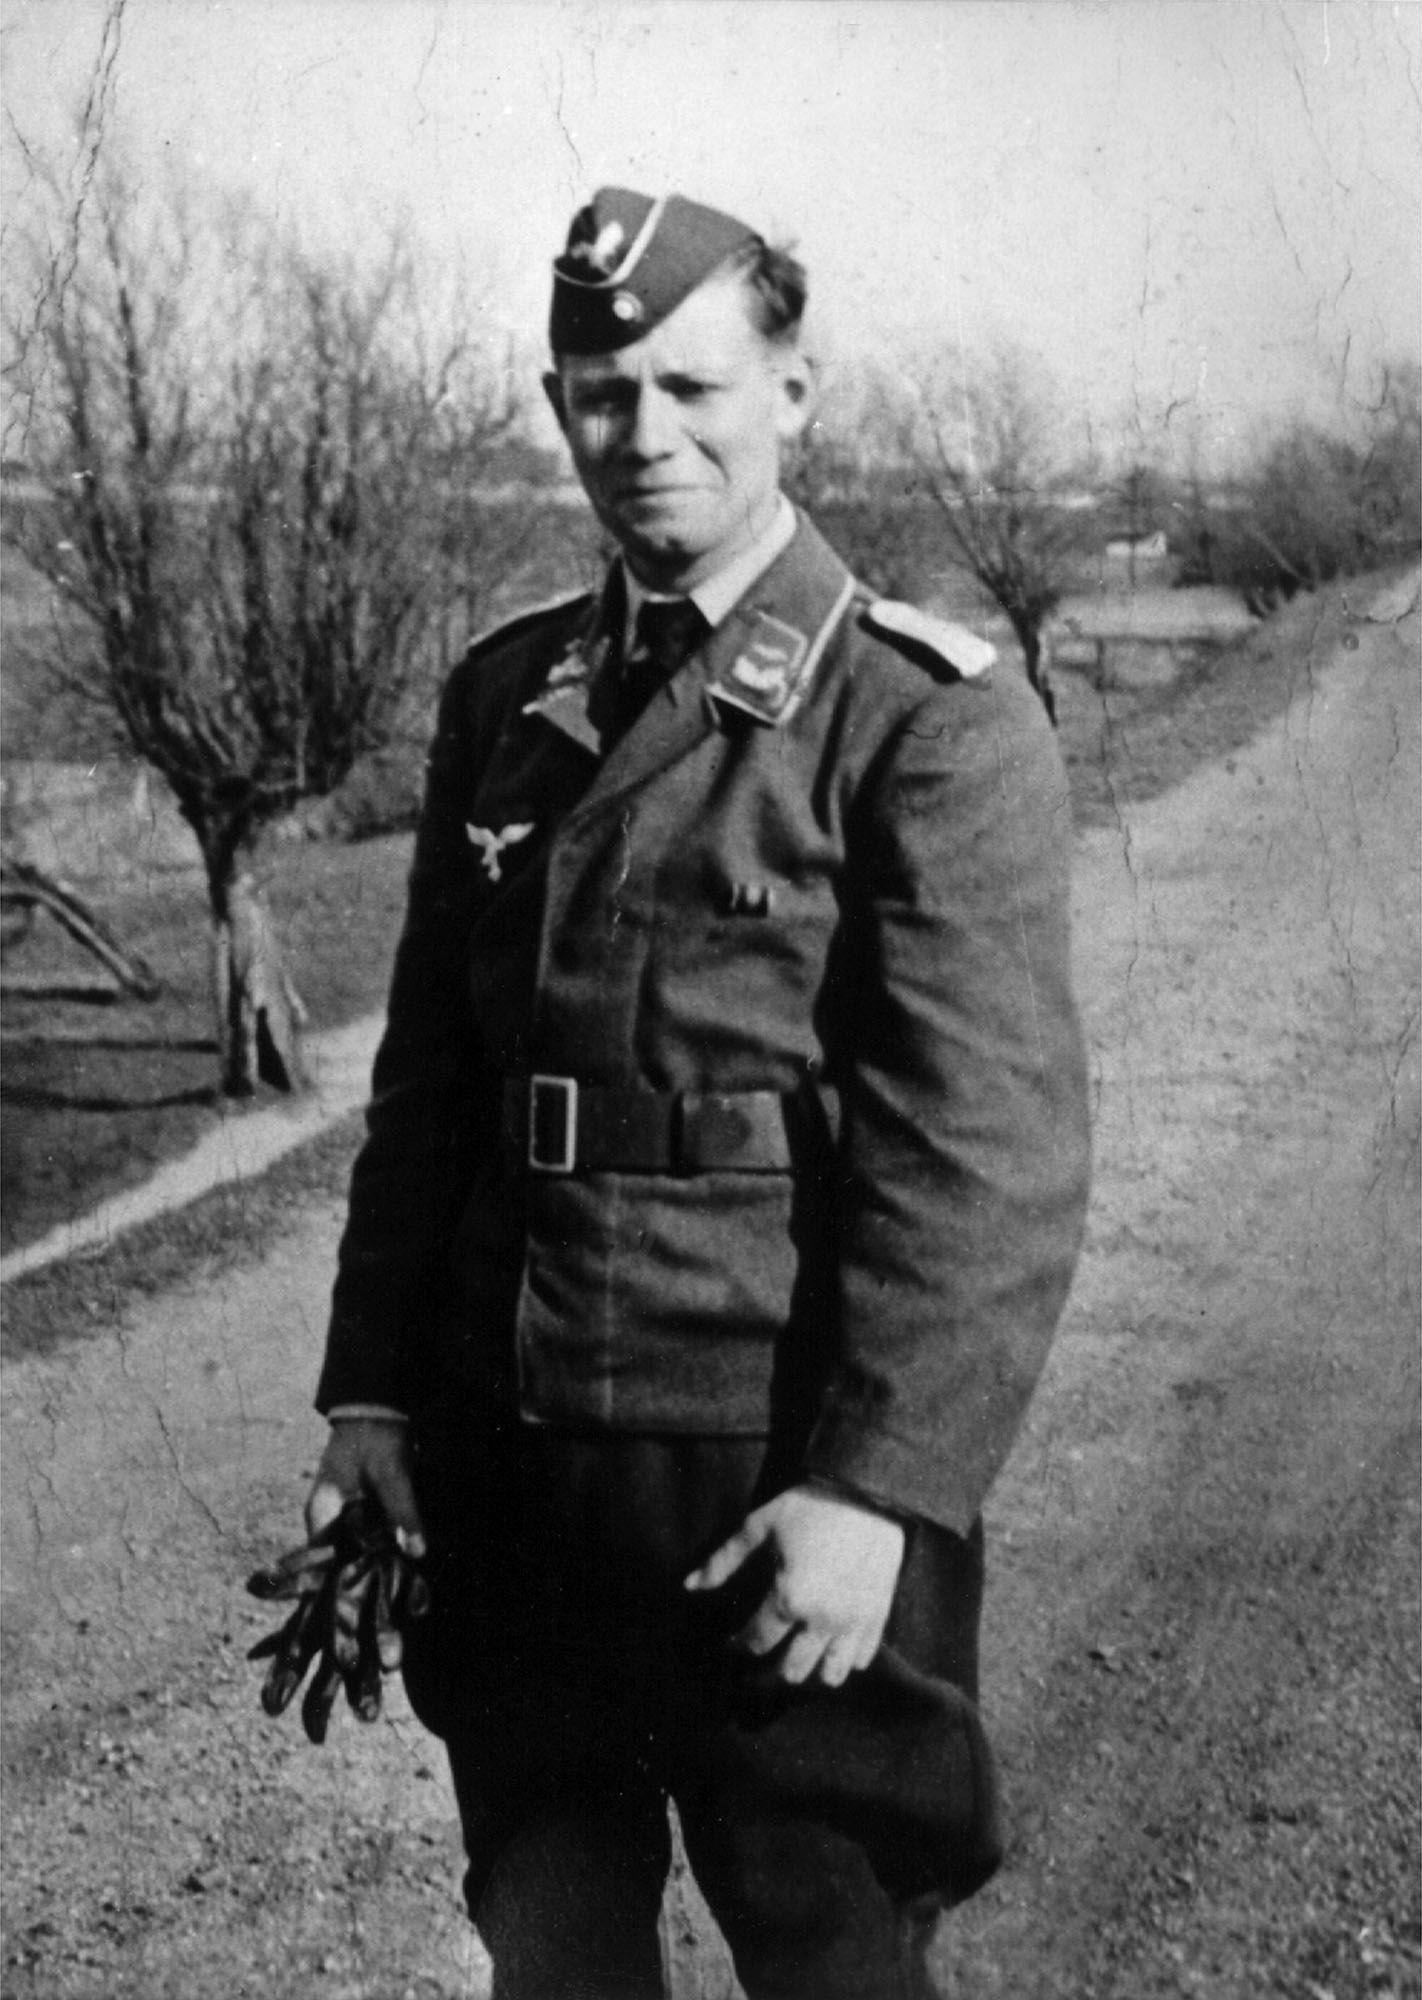 Helmut Schmidt / Wehrmacht / Uniform